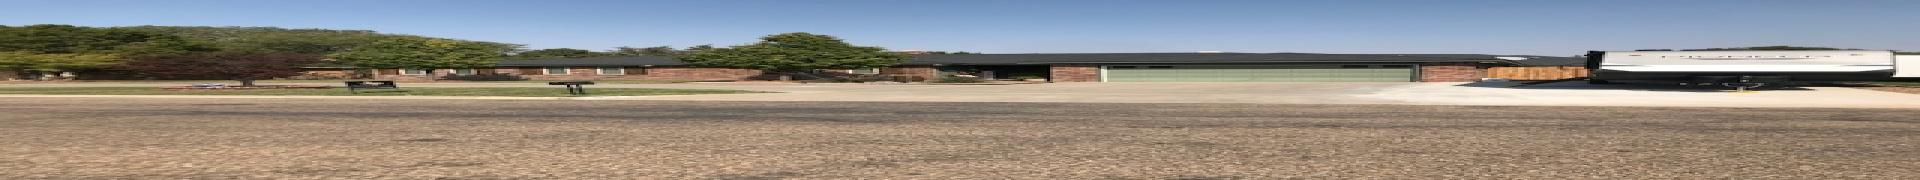 1813 Tejas Trail, Dalhart, Texas 79022, 4 Bedrooms Bedrooms, ,2 BathroomsBathrooms,Single Family Home,Sold Listings,Tejas Trail,1029